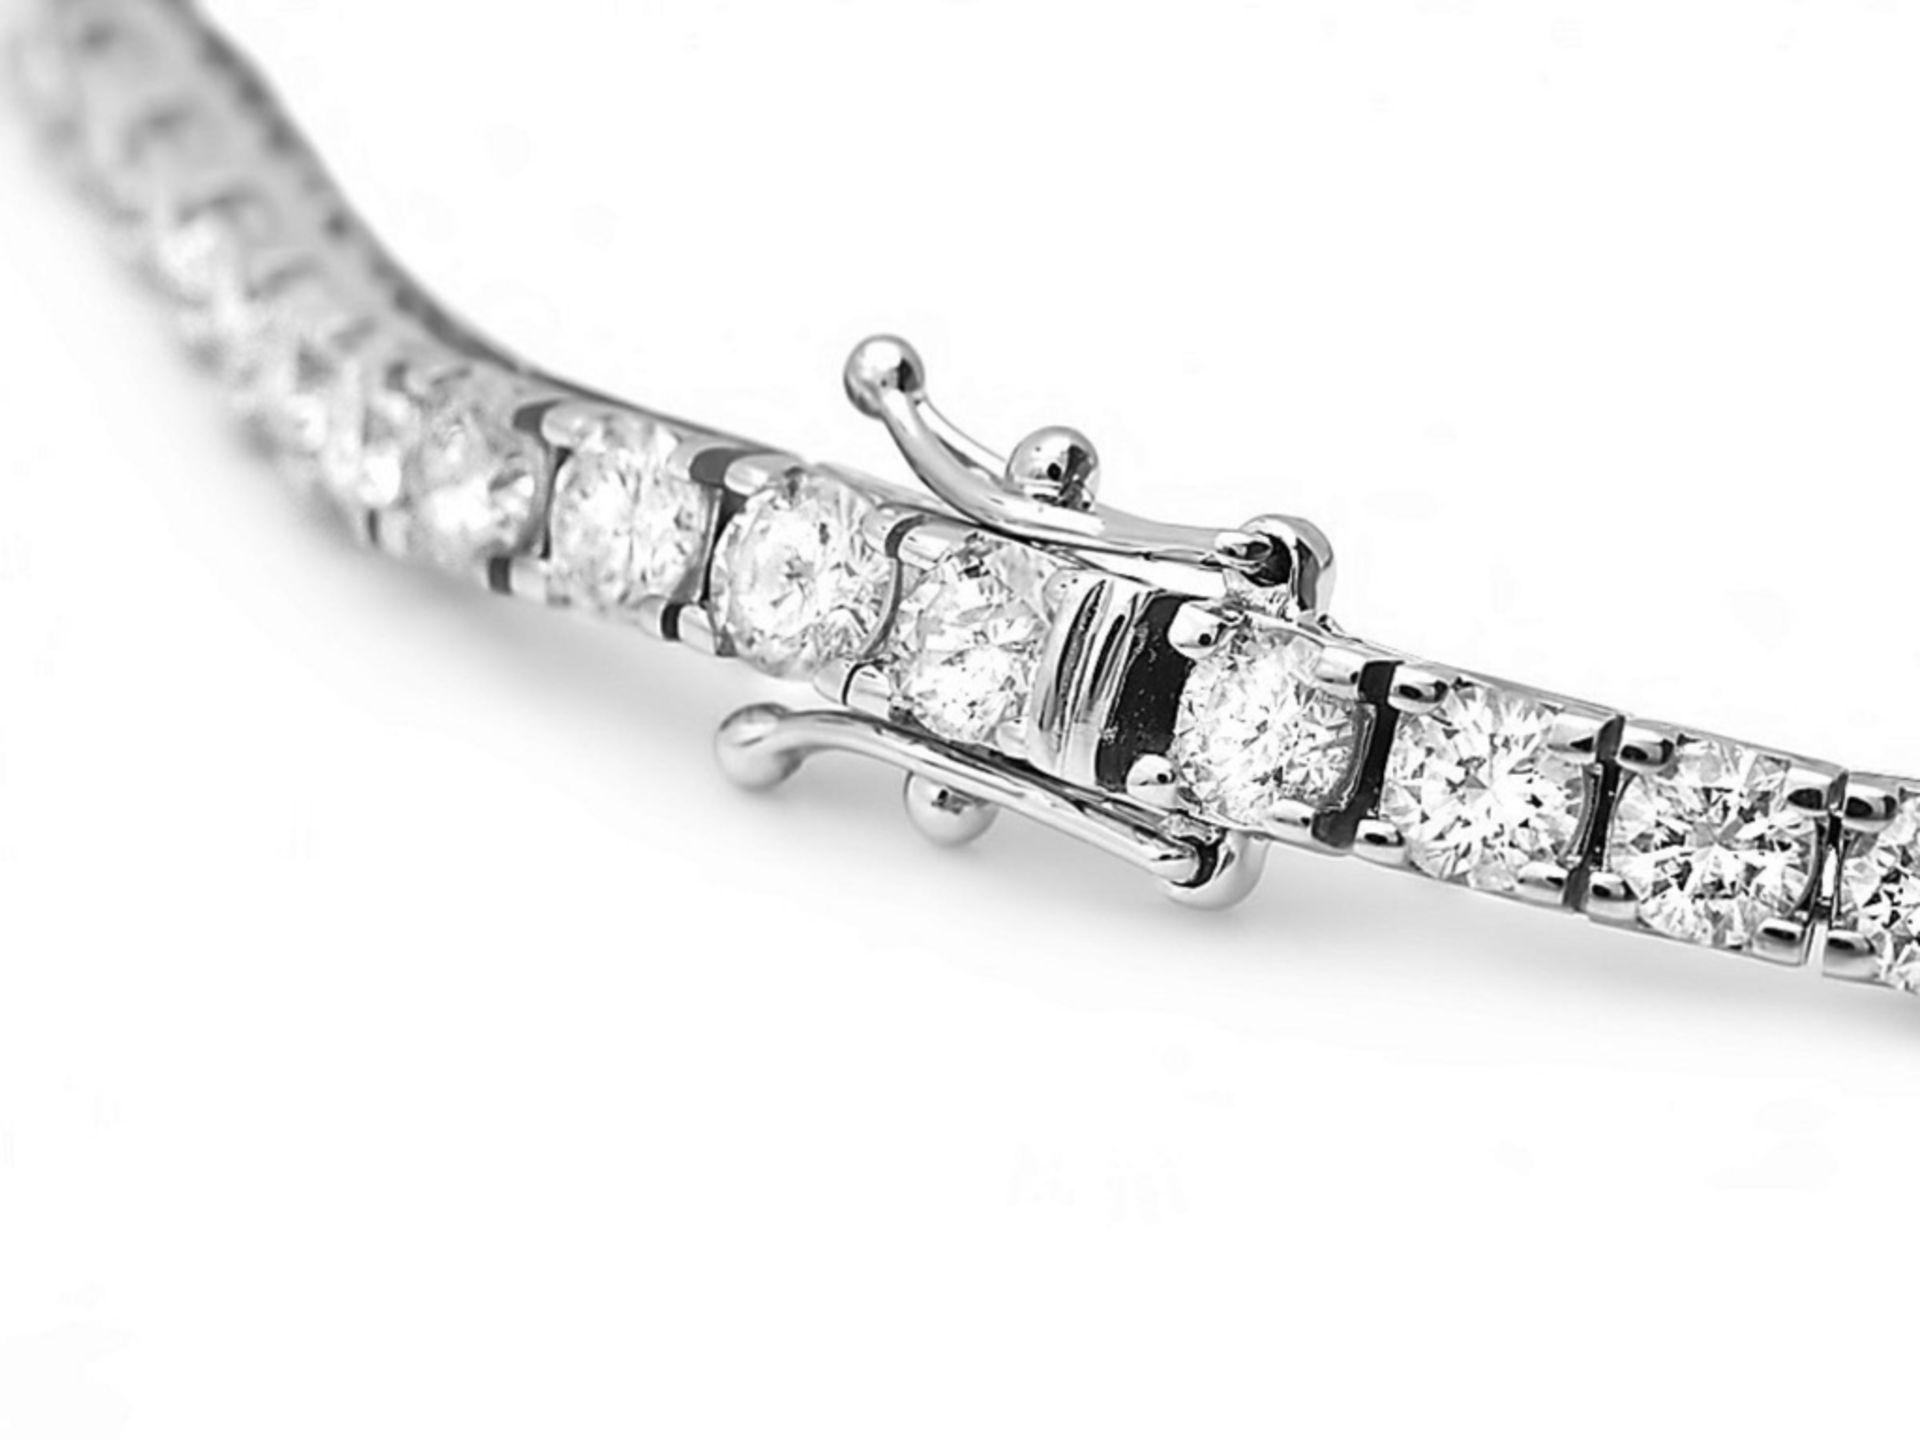 ^18k White Gold 8.00ct Diamond Bracelet - Image 3 of 4